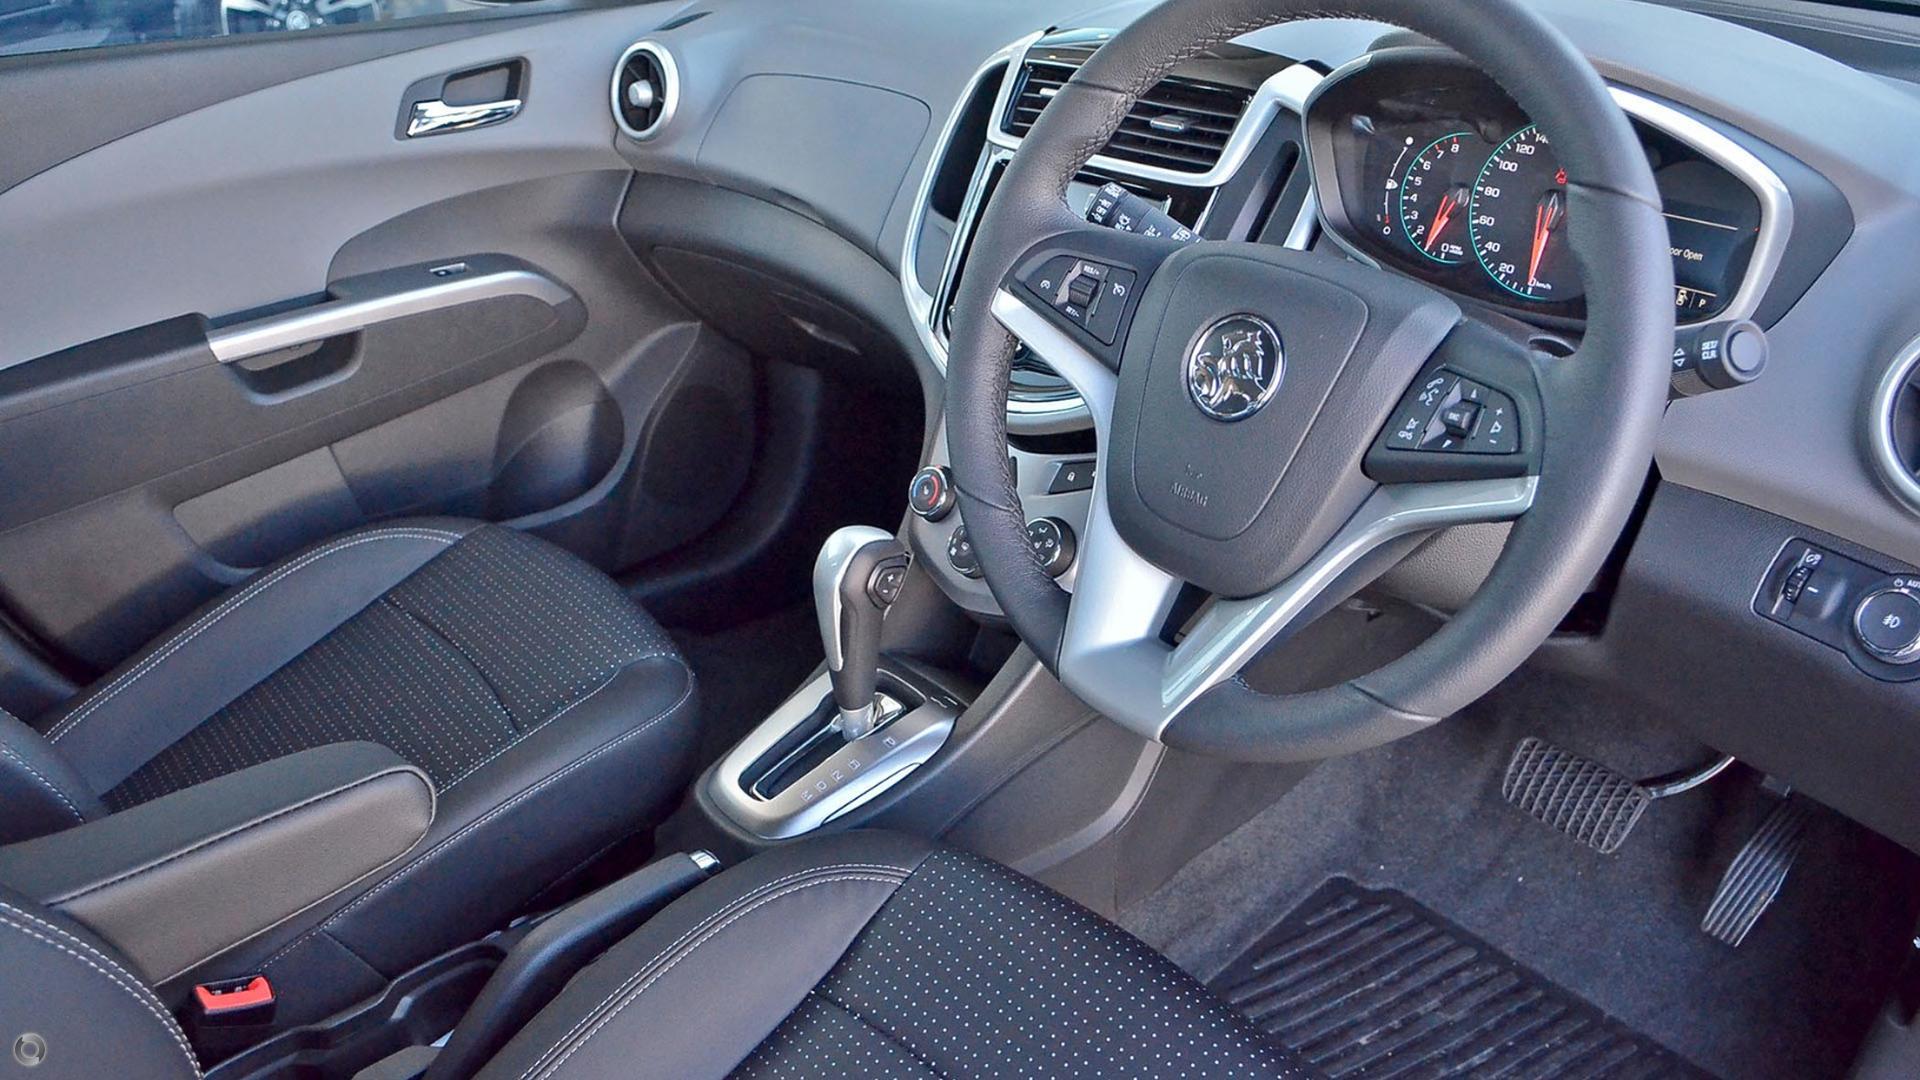 2017 Holden Barina LT TM